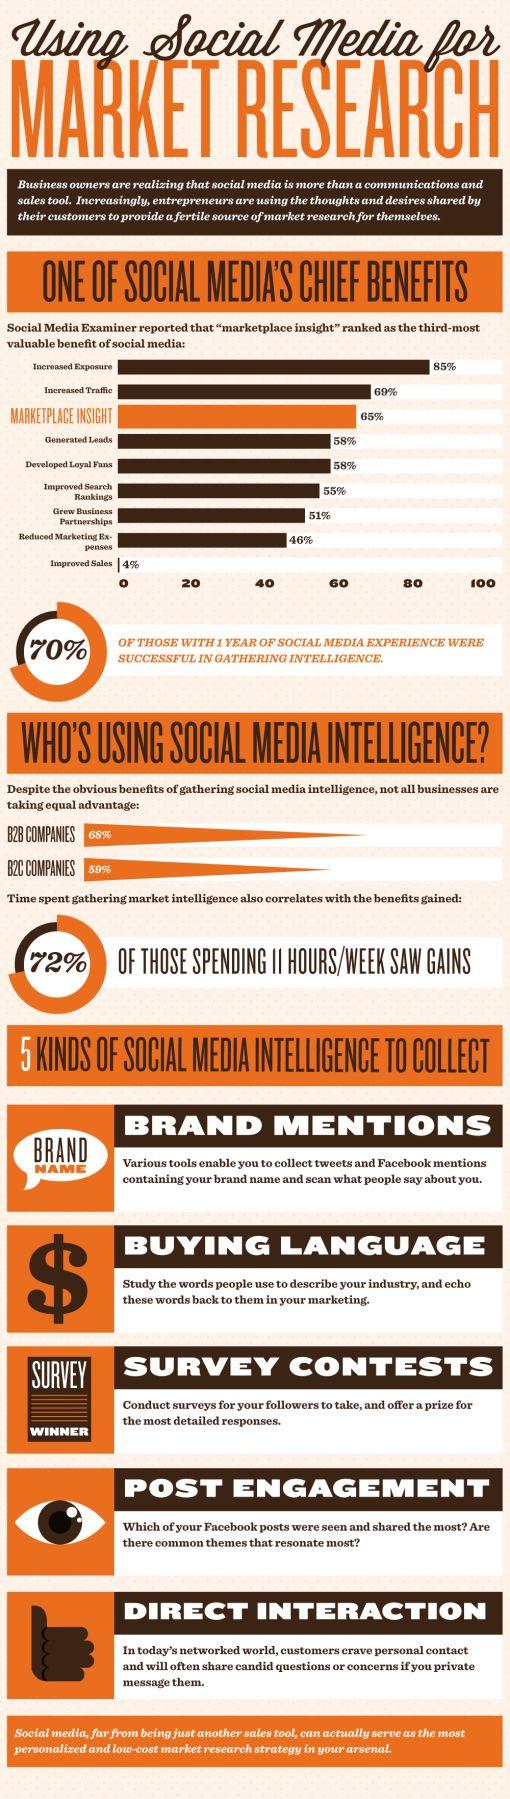 social-media-customer-research